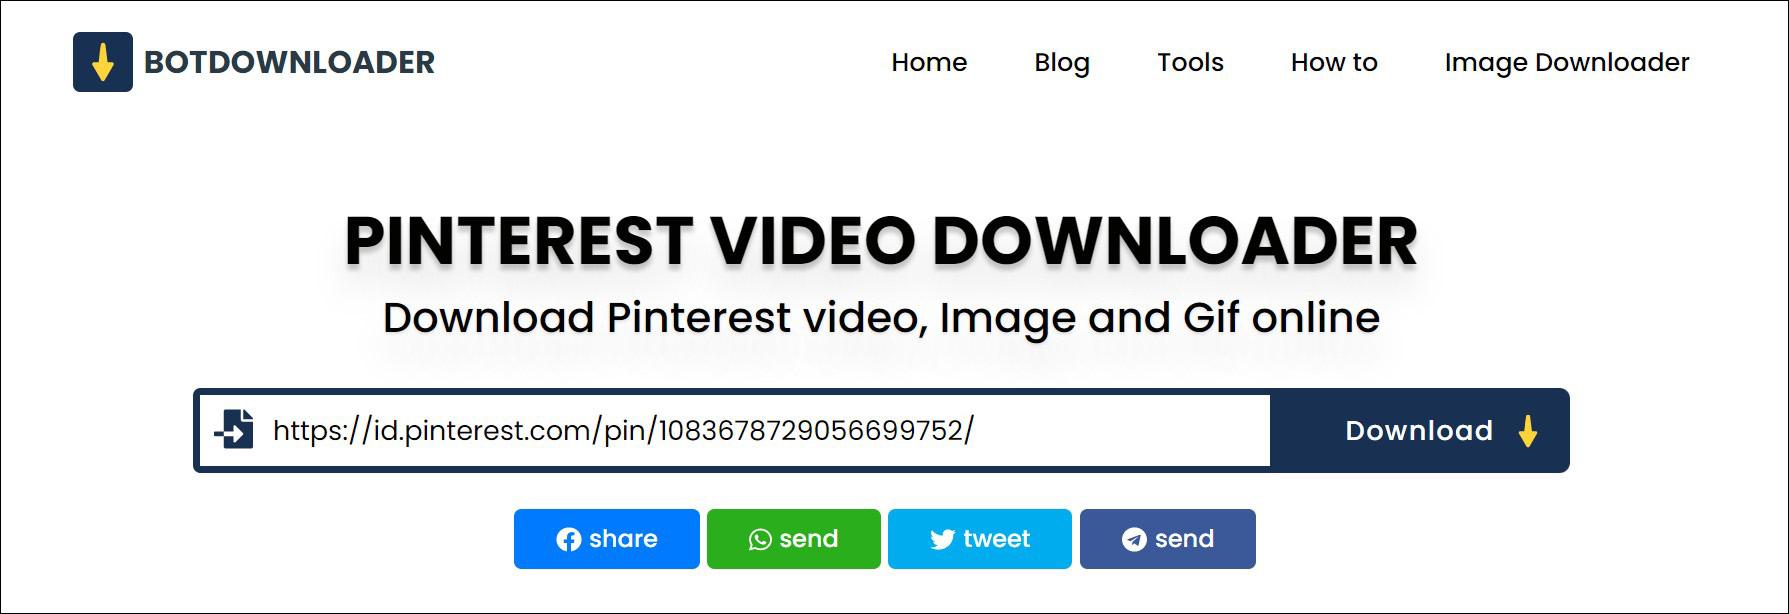 1 Tempel link video Pinterest